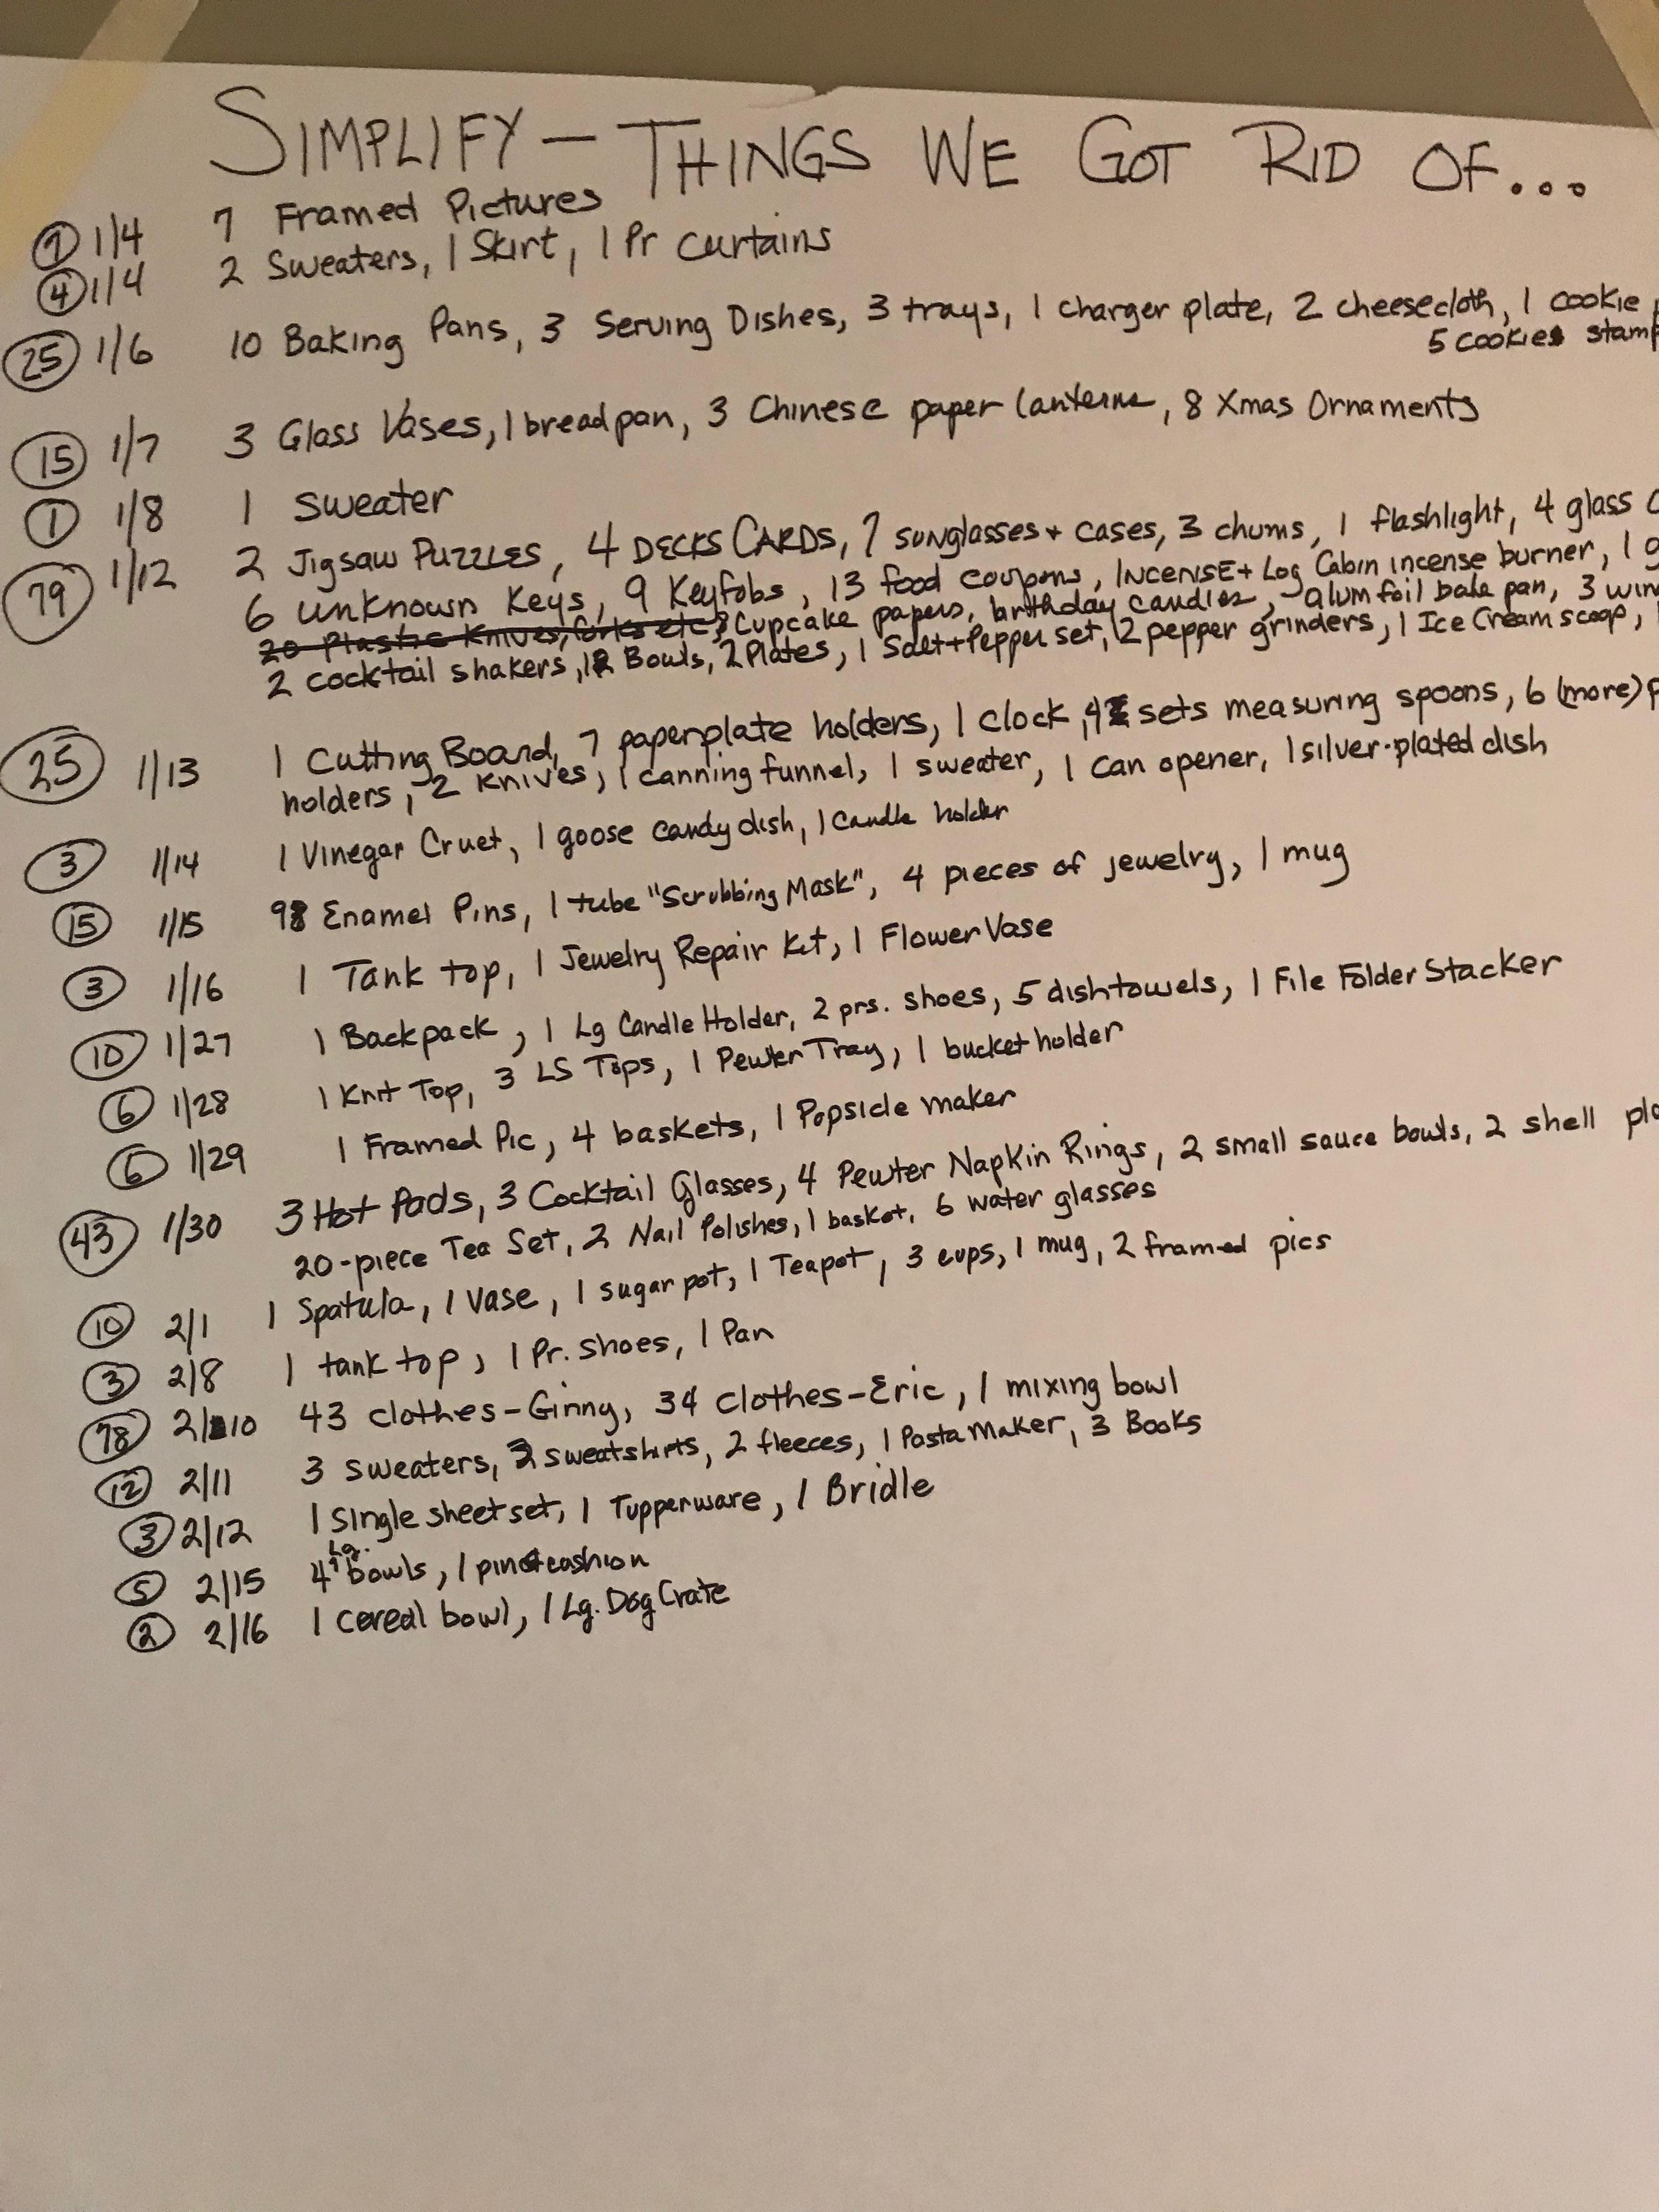 My list 02-17-19